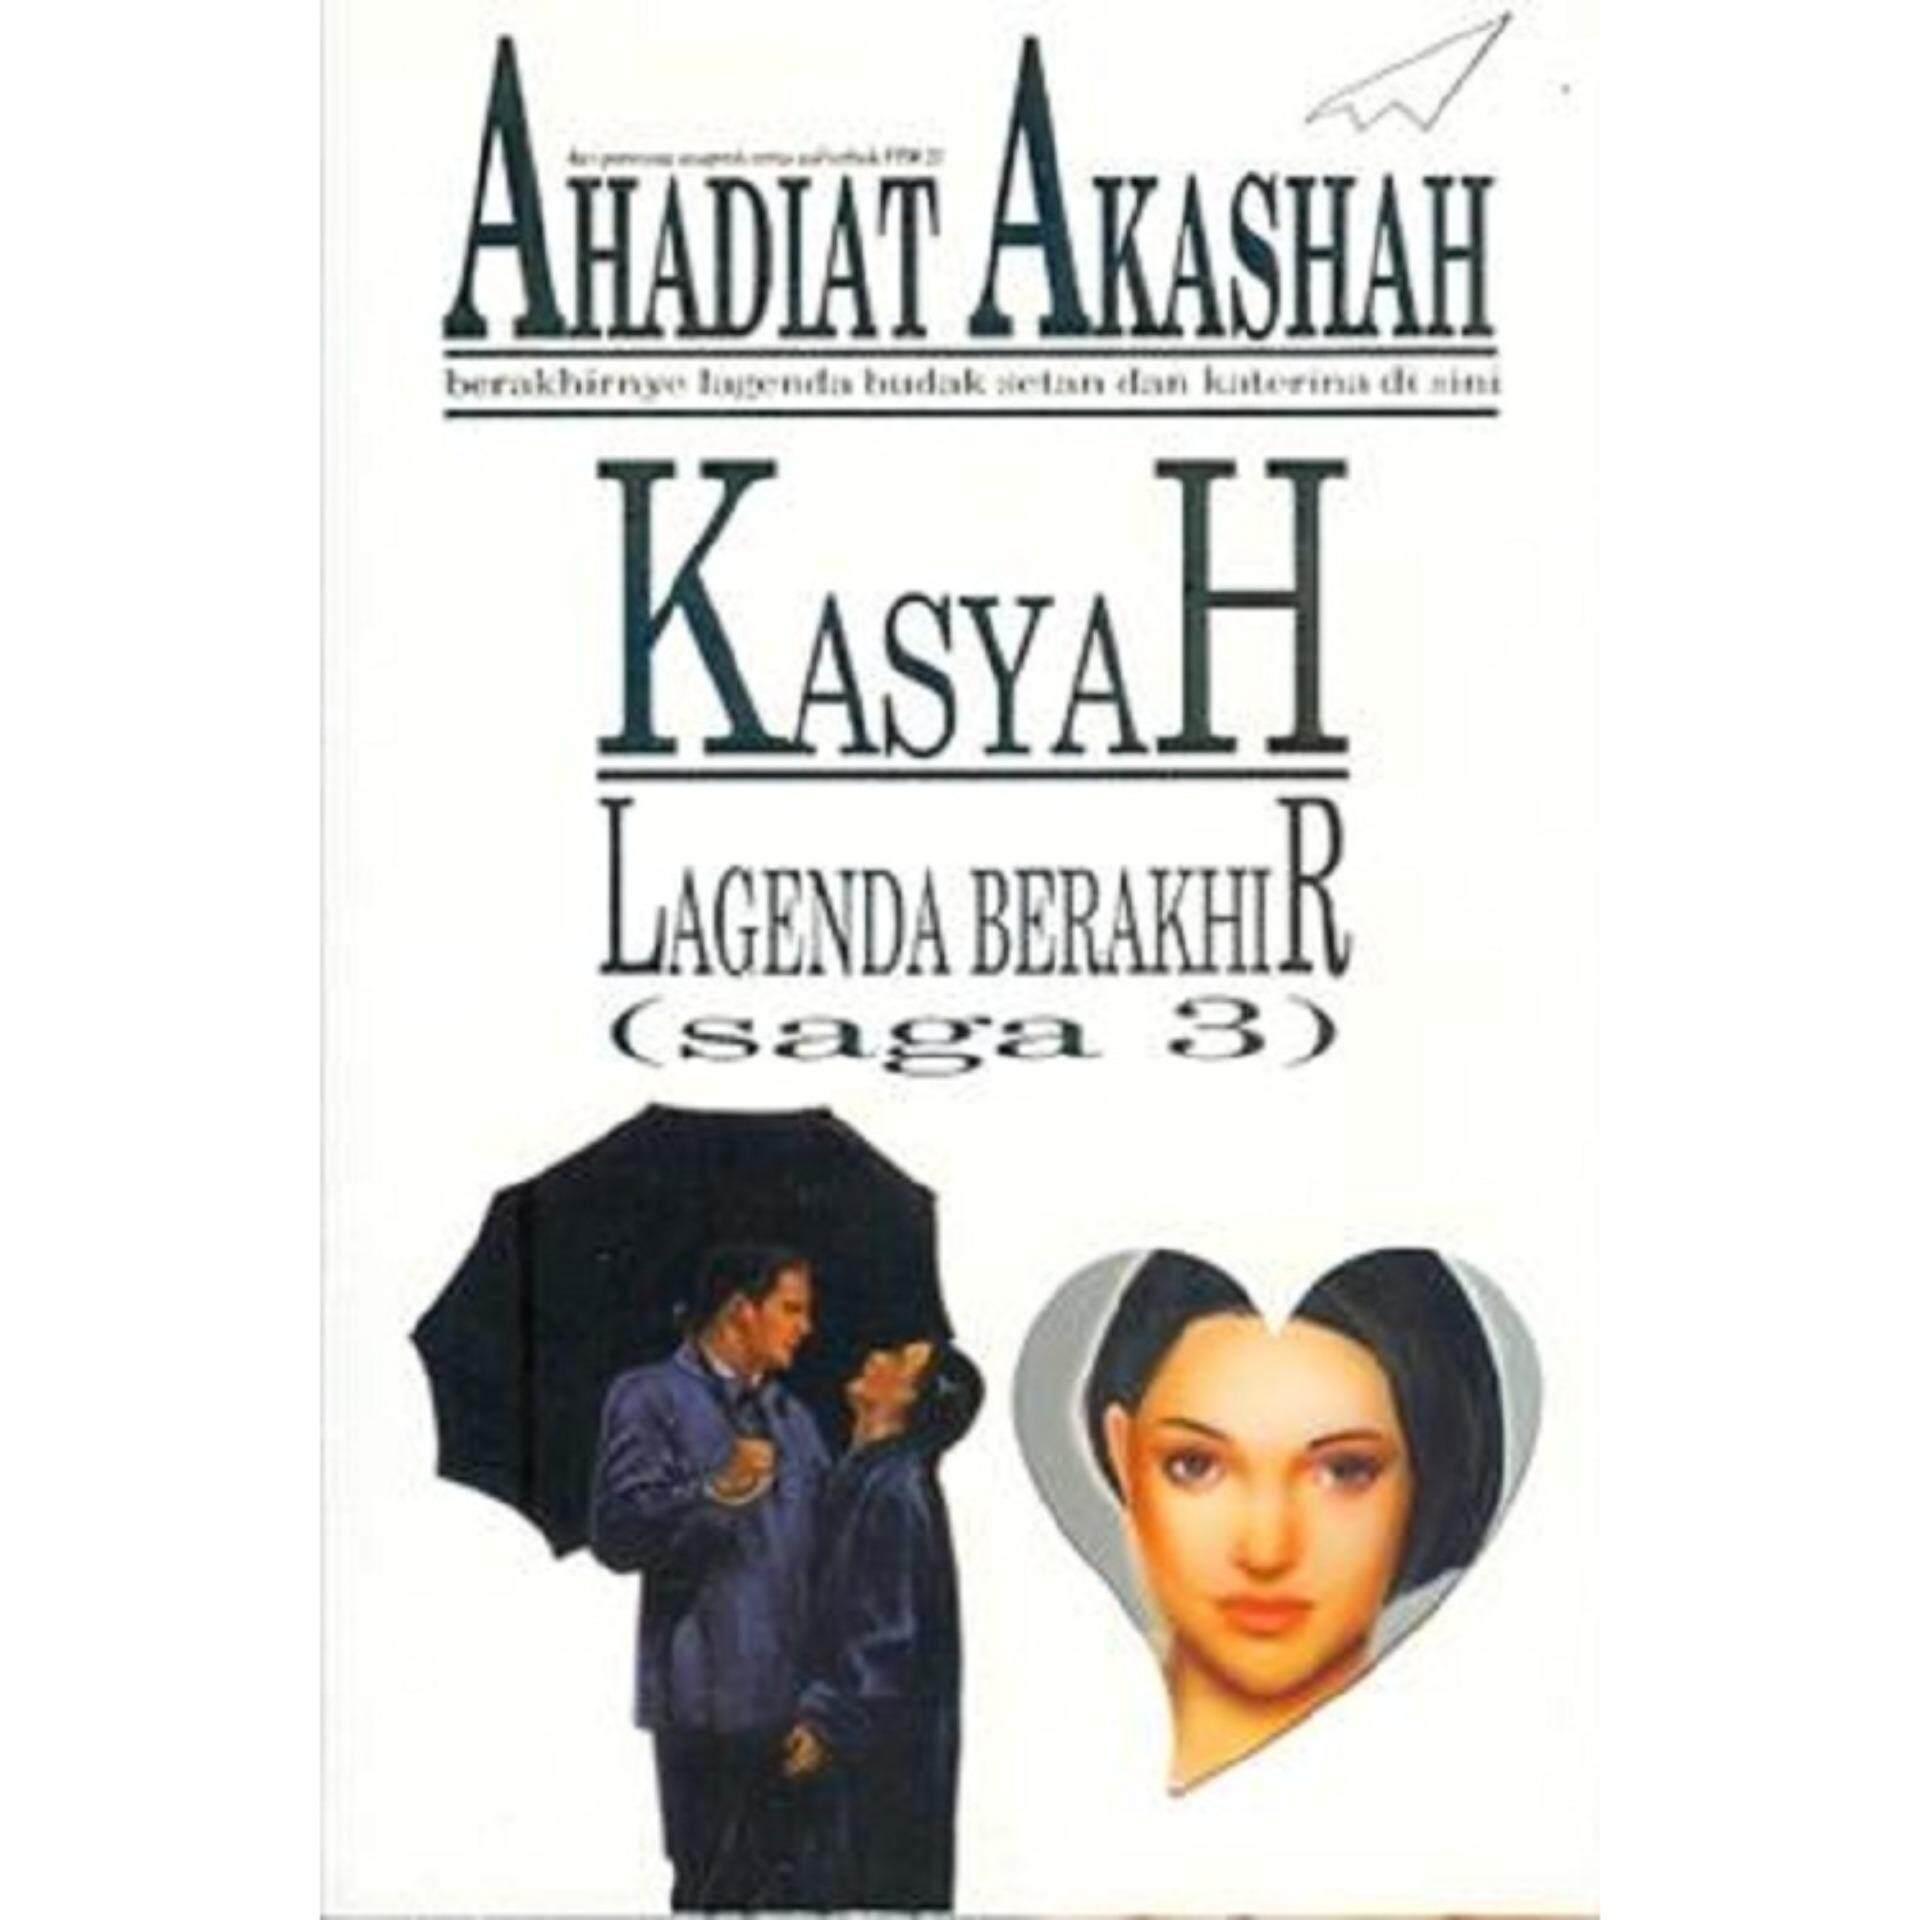 Kasyah: Lagenda Berakhir (saga 3) - Isbn : 9789833642182 Author Ahadiat Akashah By Mph Bookstores.